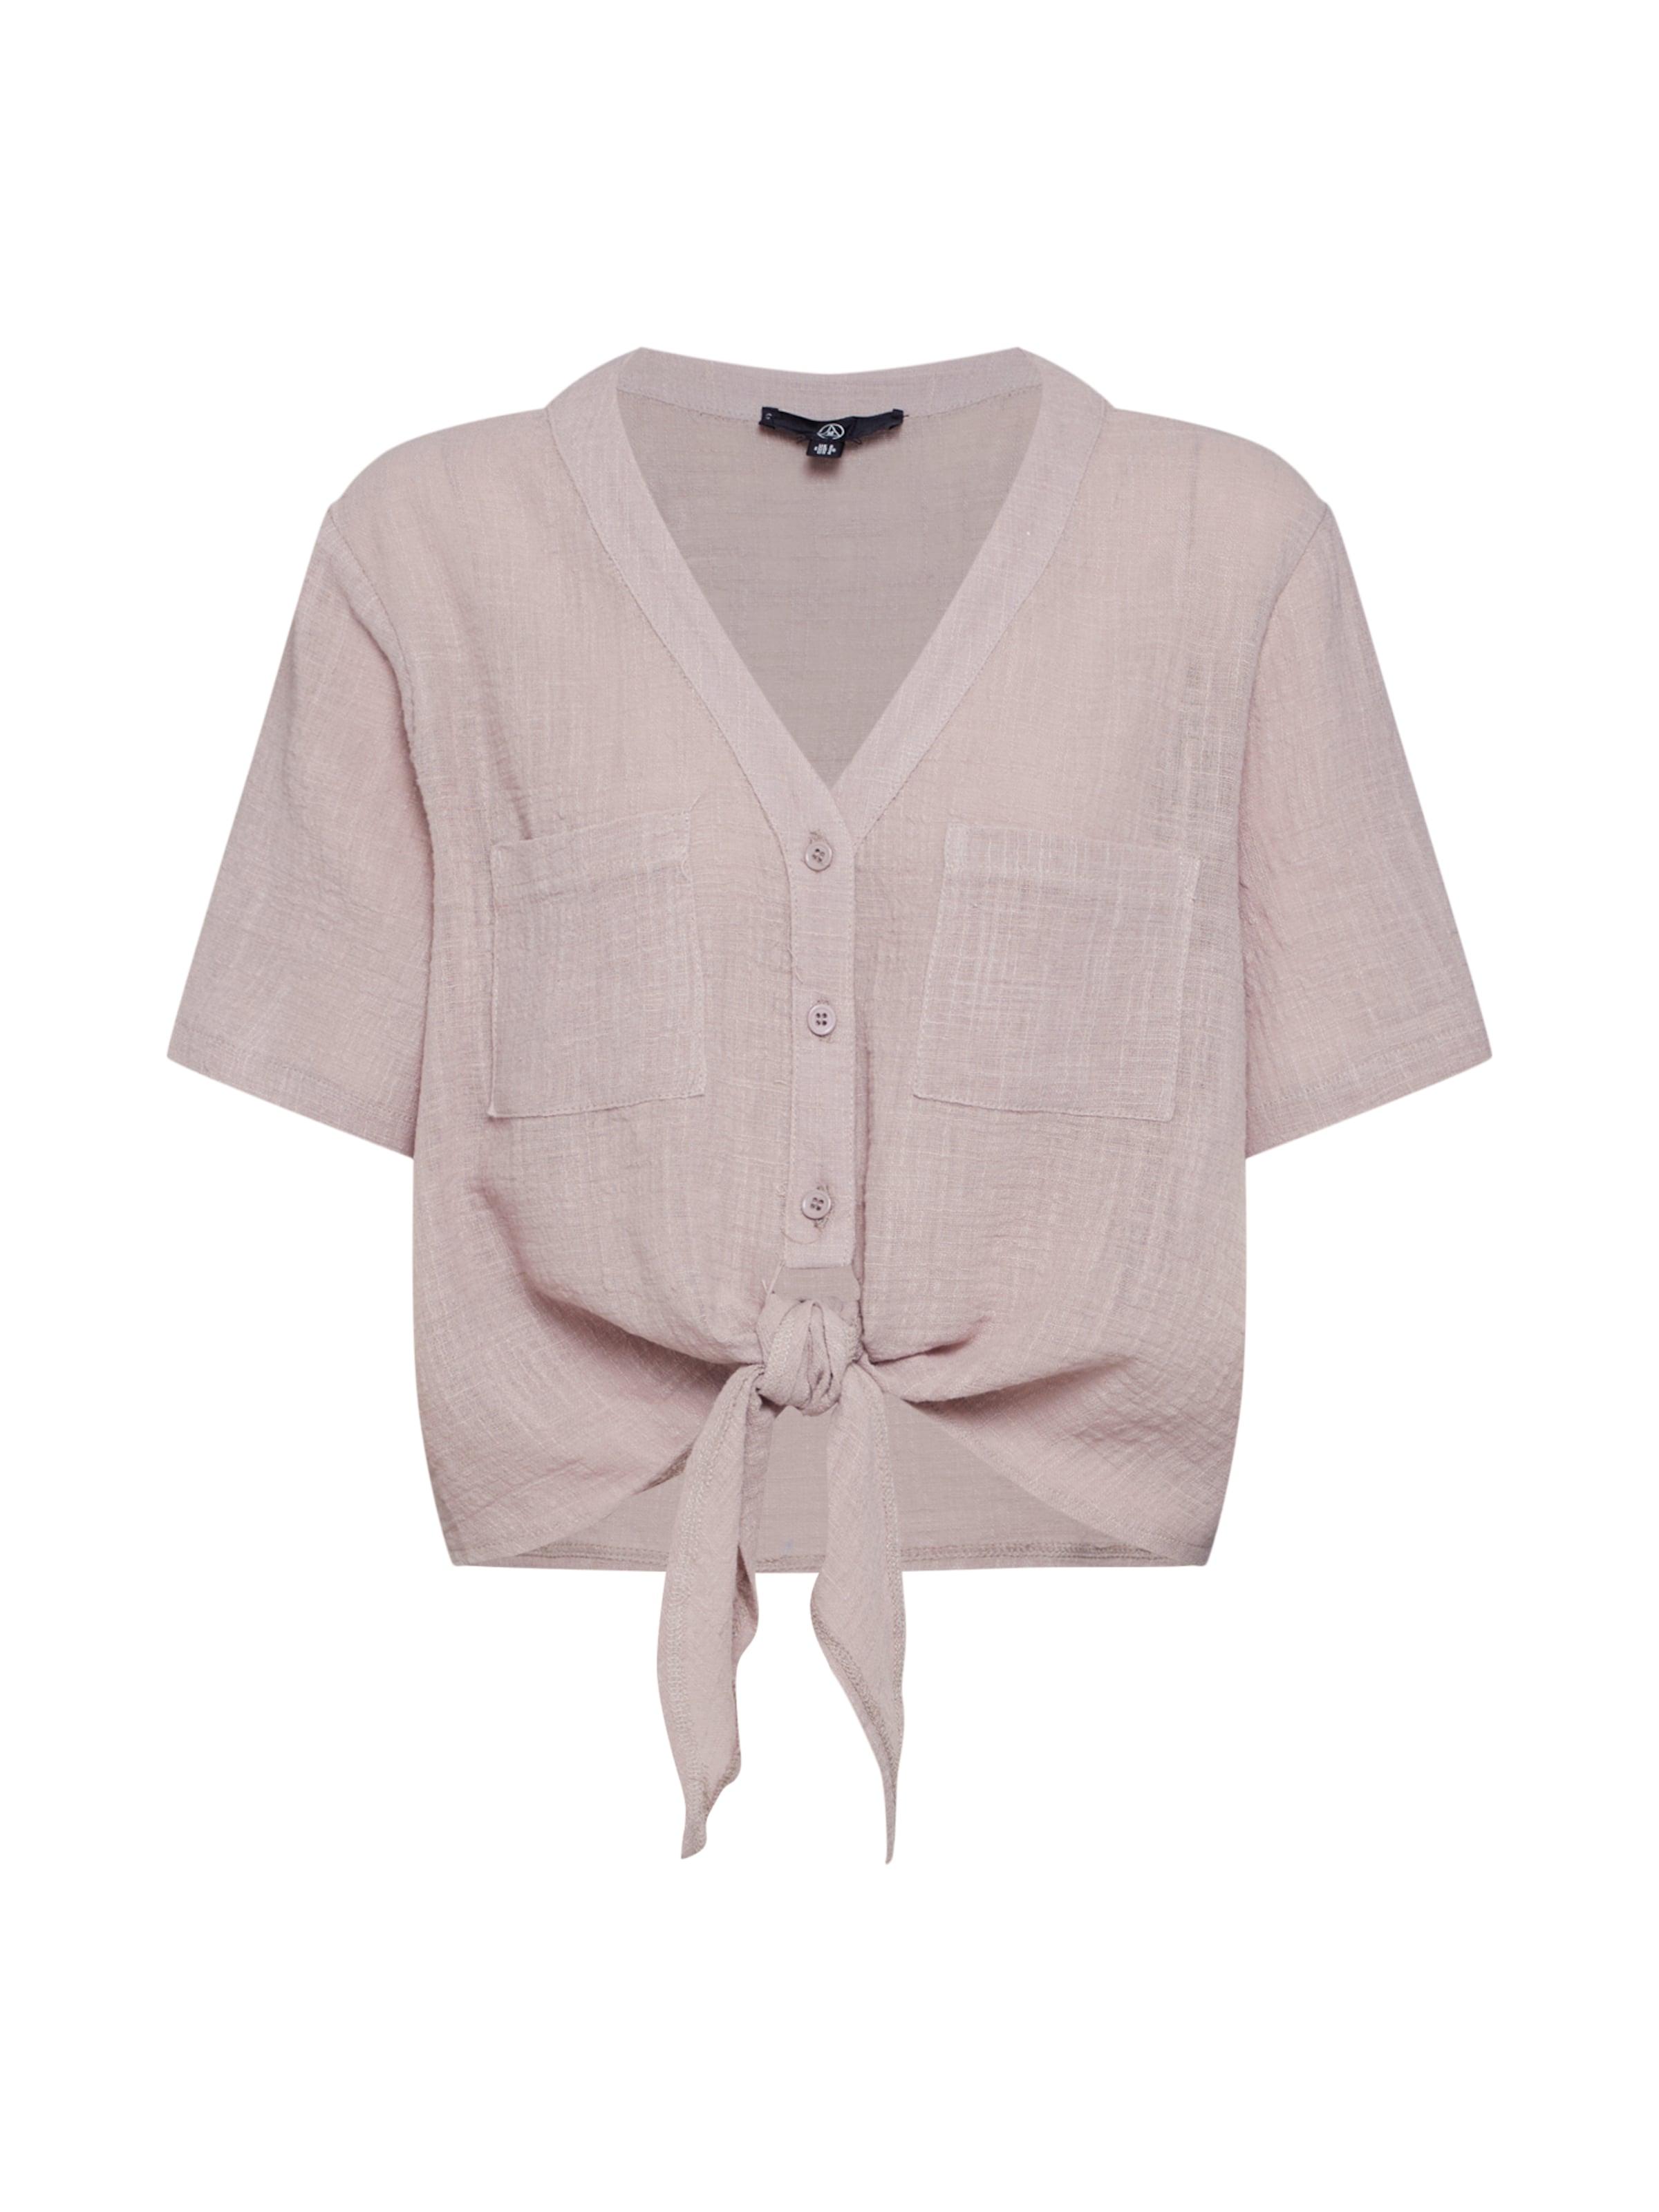 Shirt' Linen Front T En Missguided 'tie Crop shirt Taupe 8PnwO0k